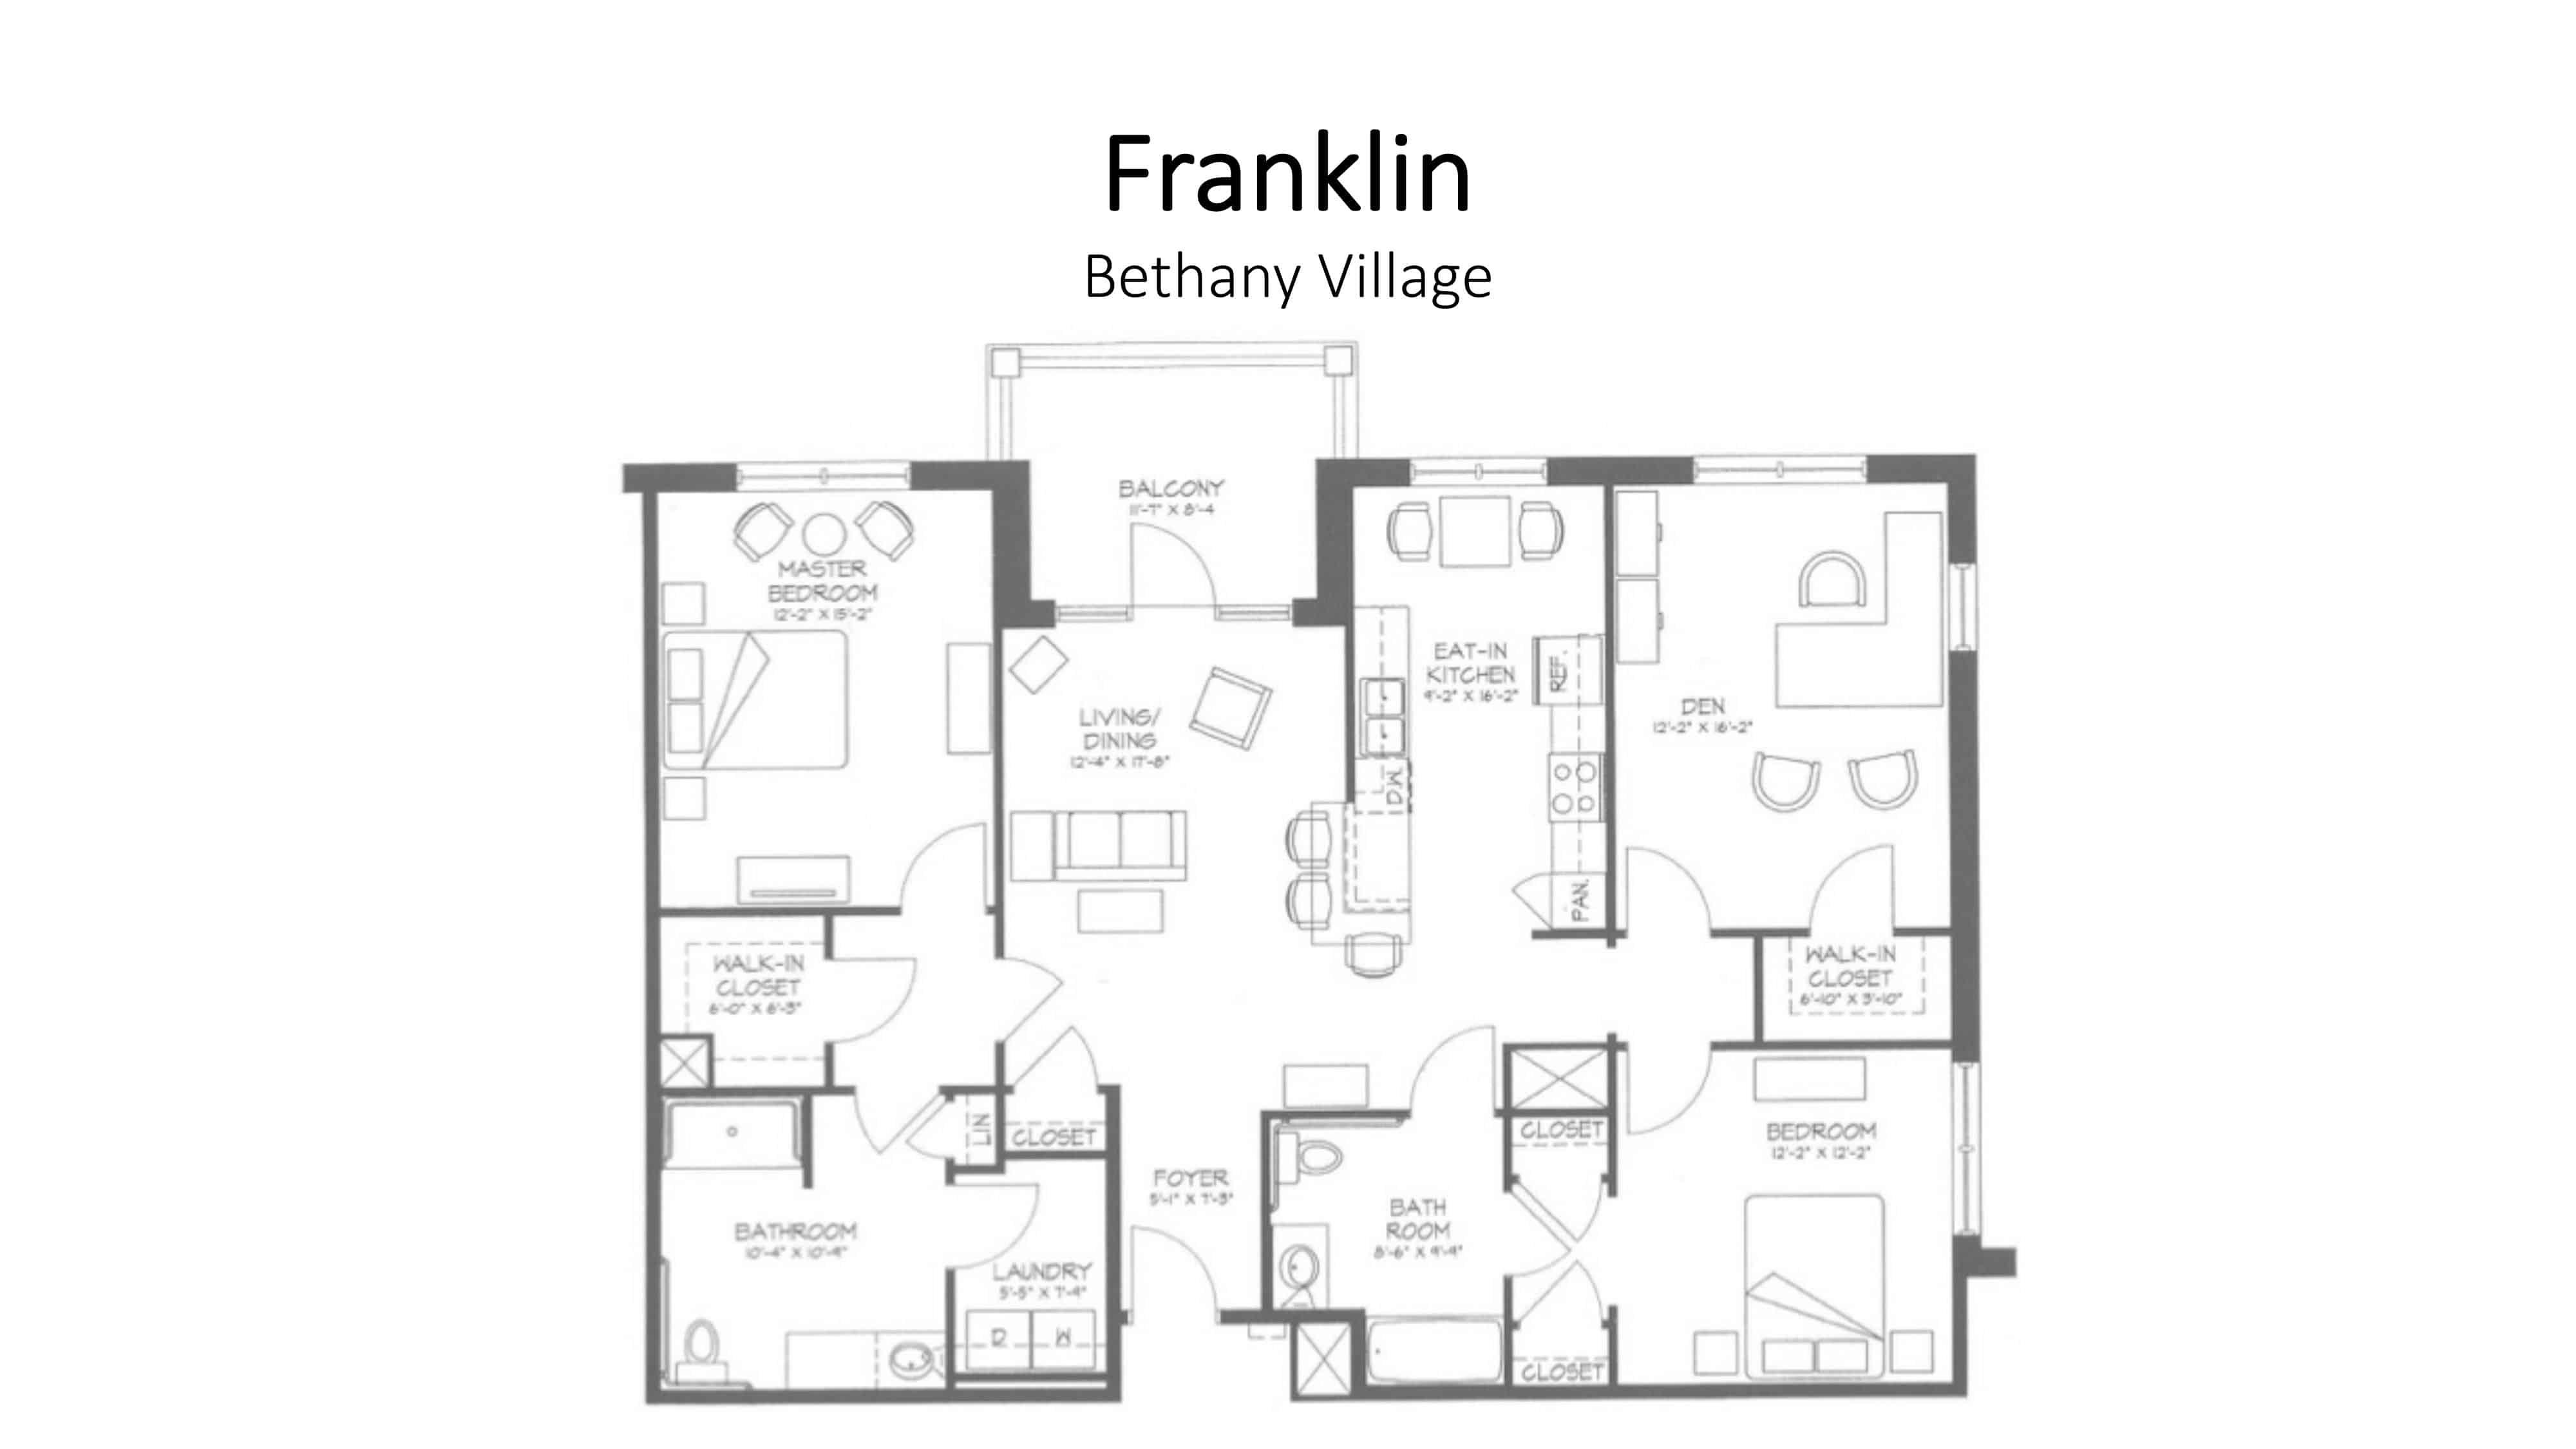 BV_Franklin